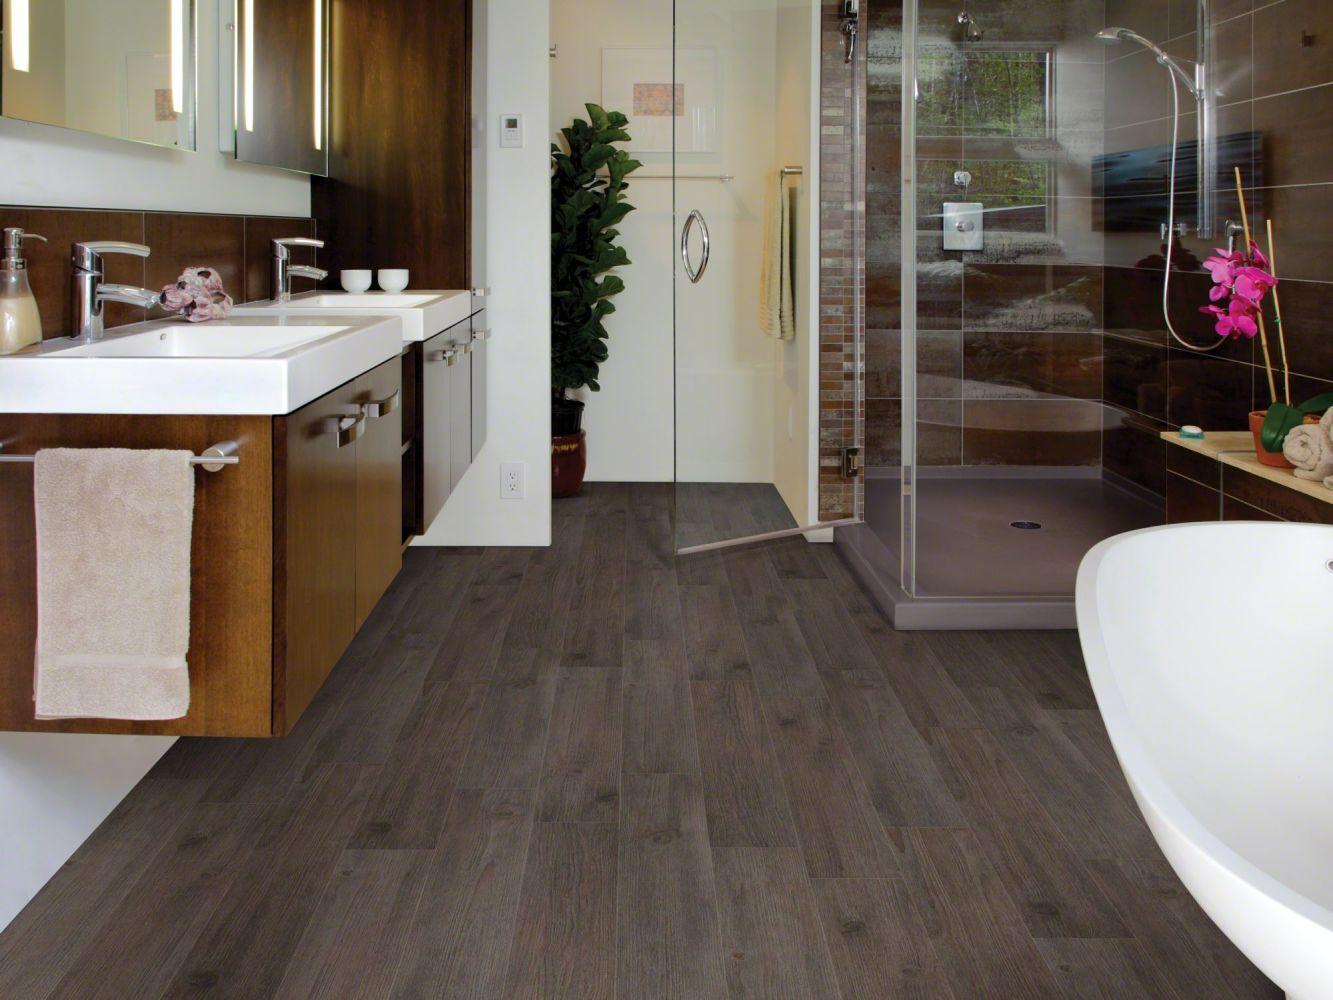 Shaw Floors Vinyl Residential Urbanality 20 P Skyline 00759_0330V